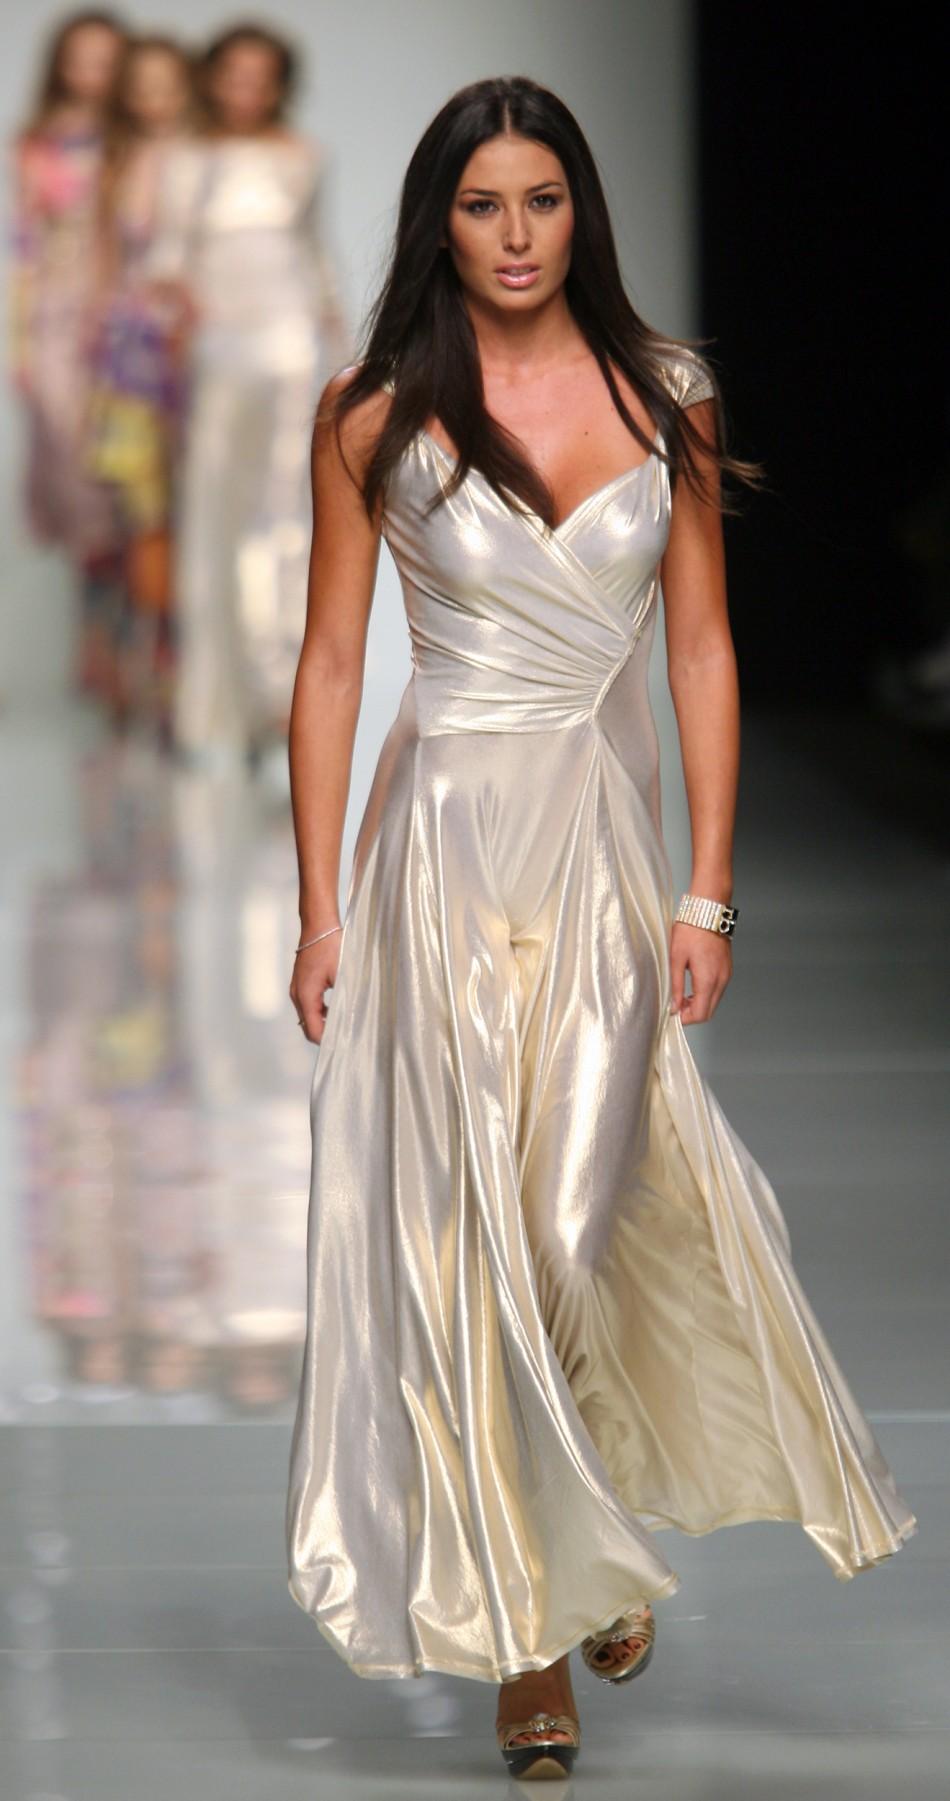 Flavio Briatore married model Elisabetta Gregoraci